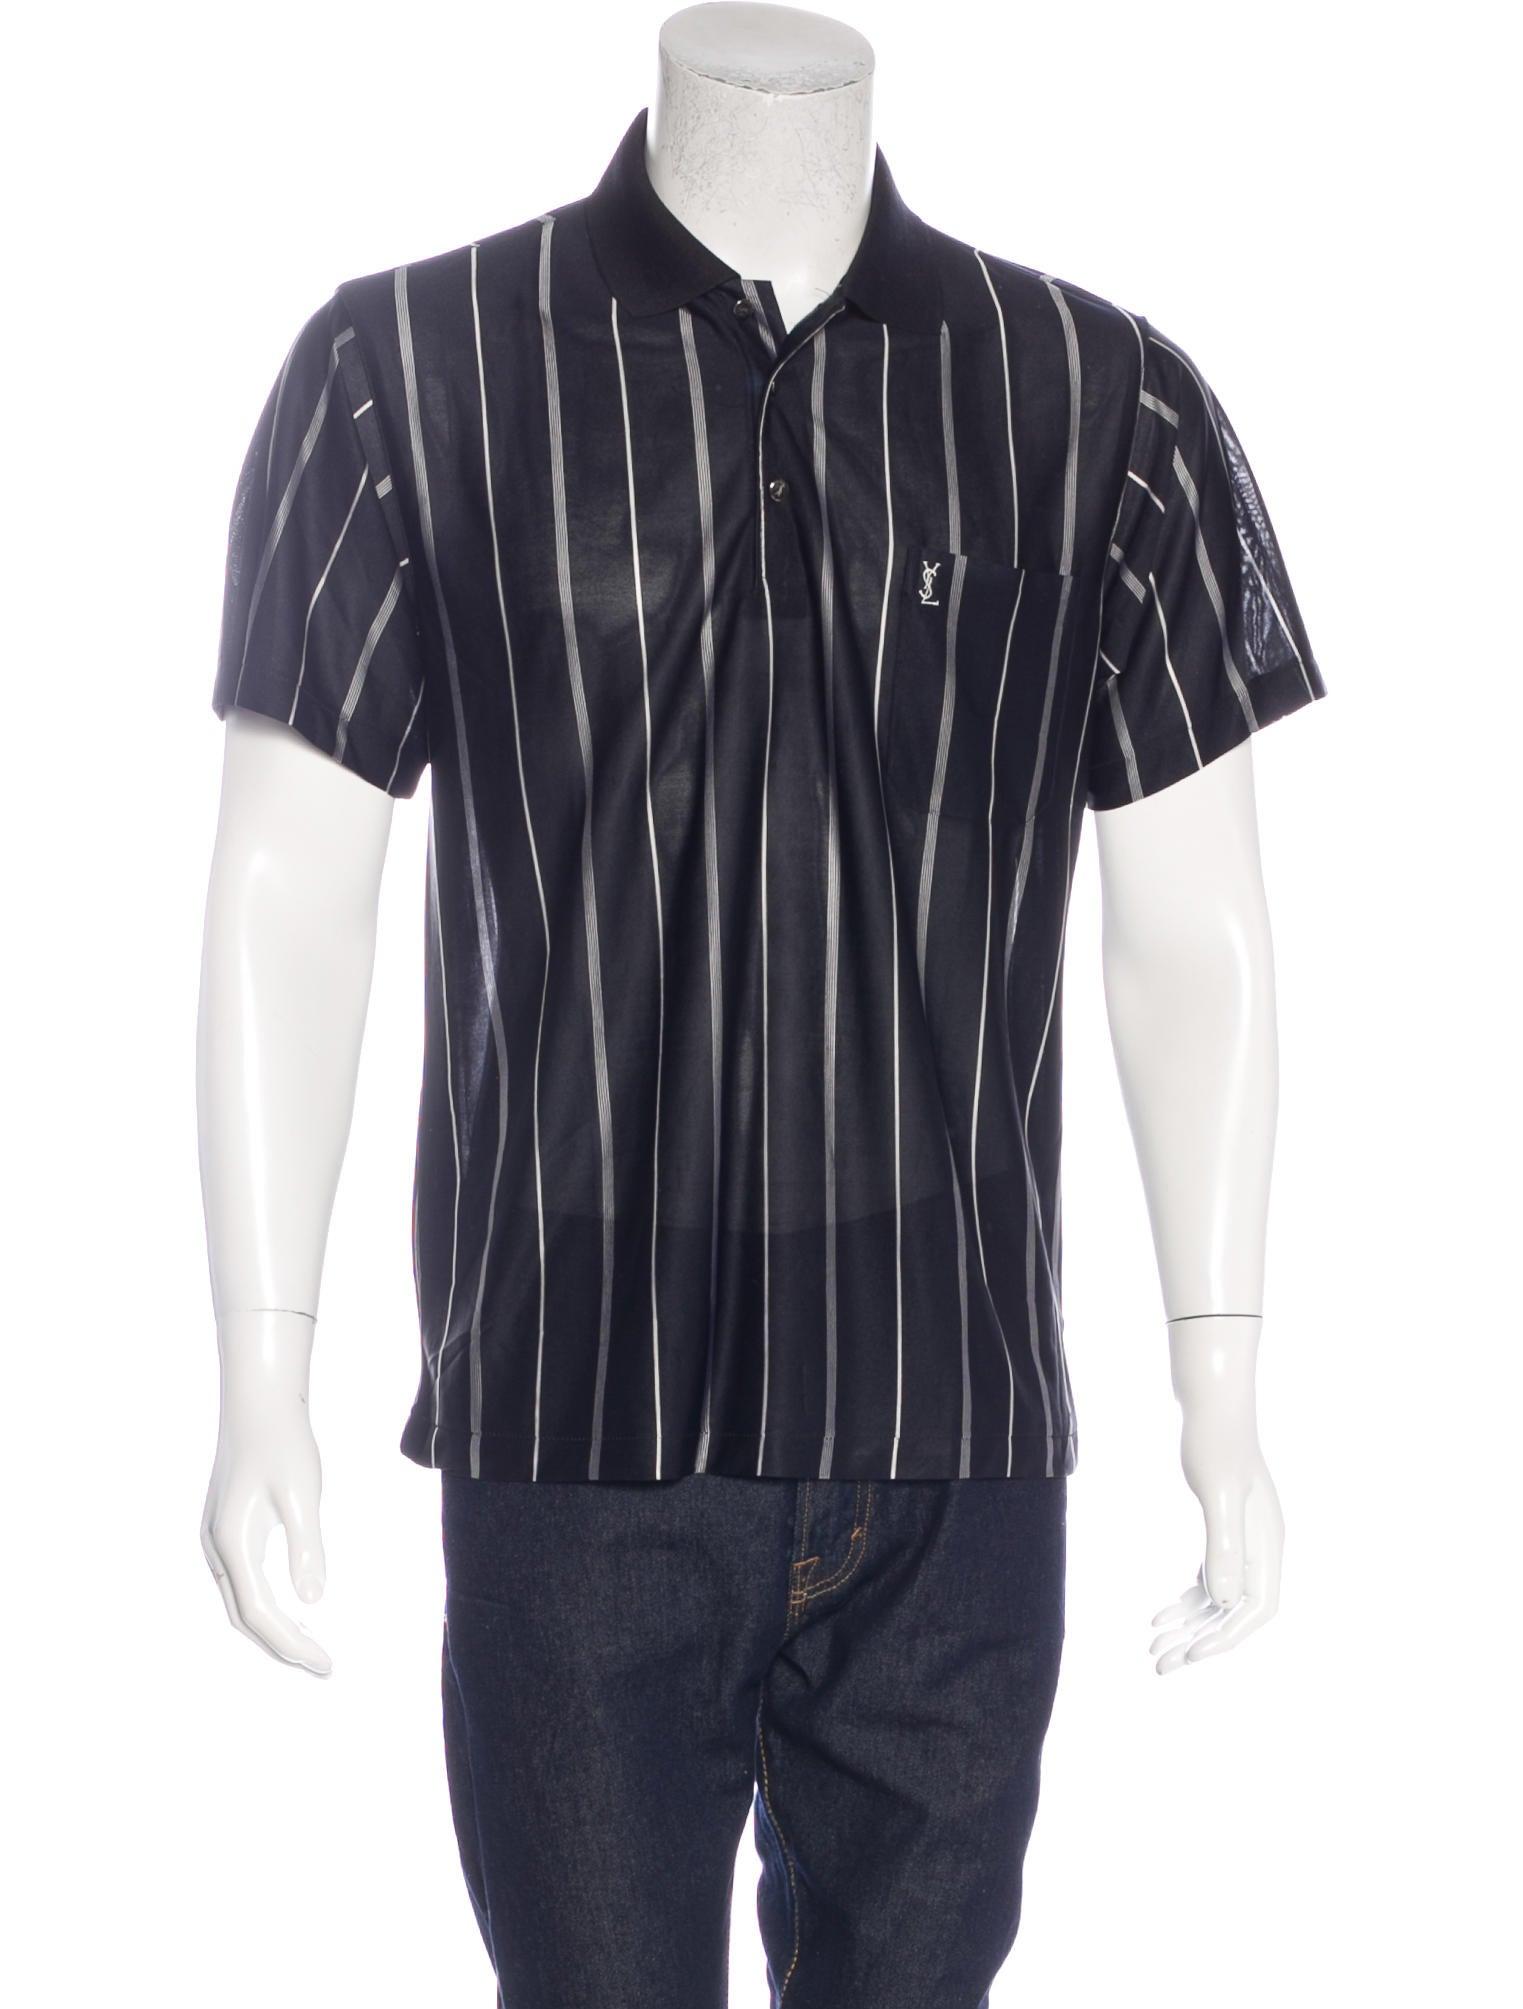 Yves Saint Laurent Striped Silk Polo Shirt Clothing